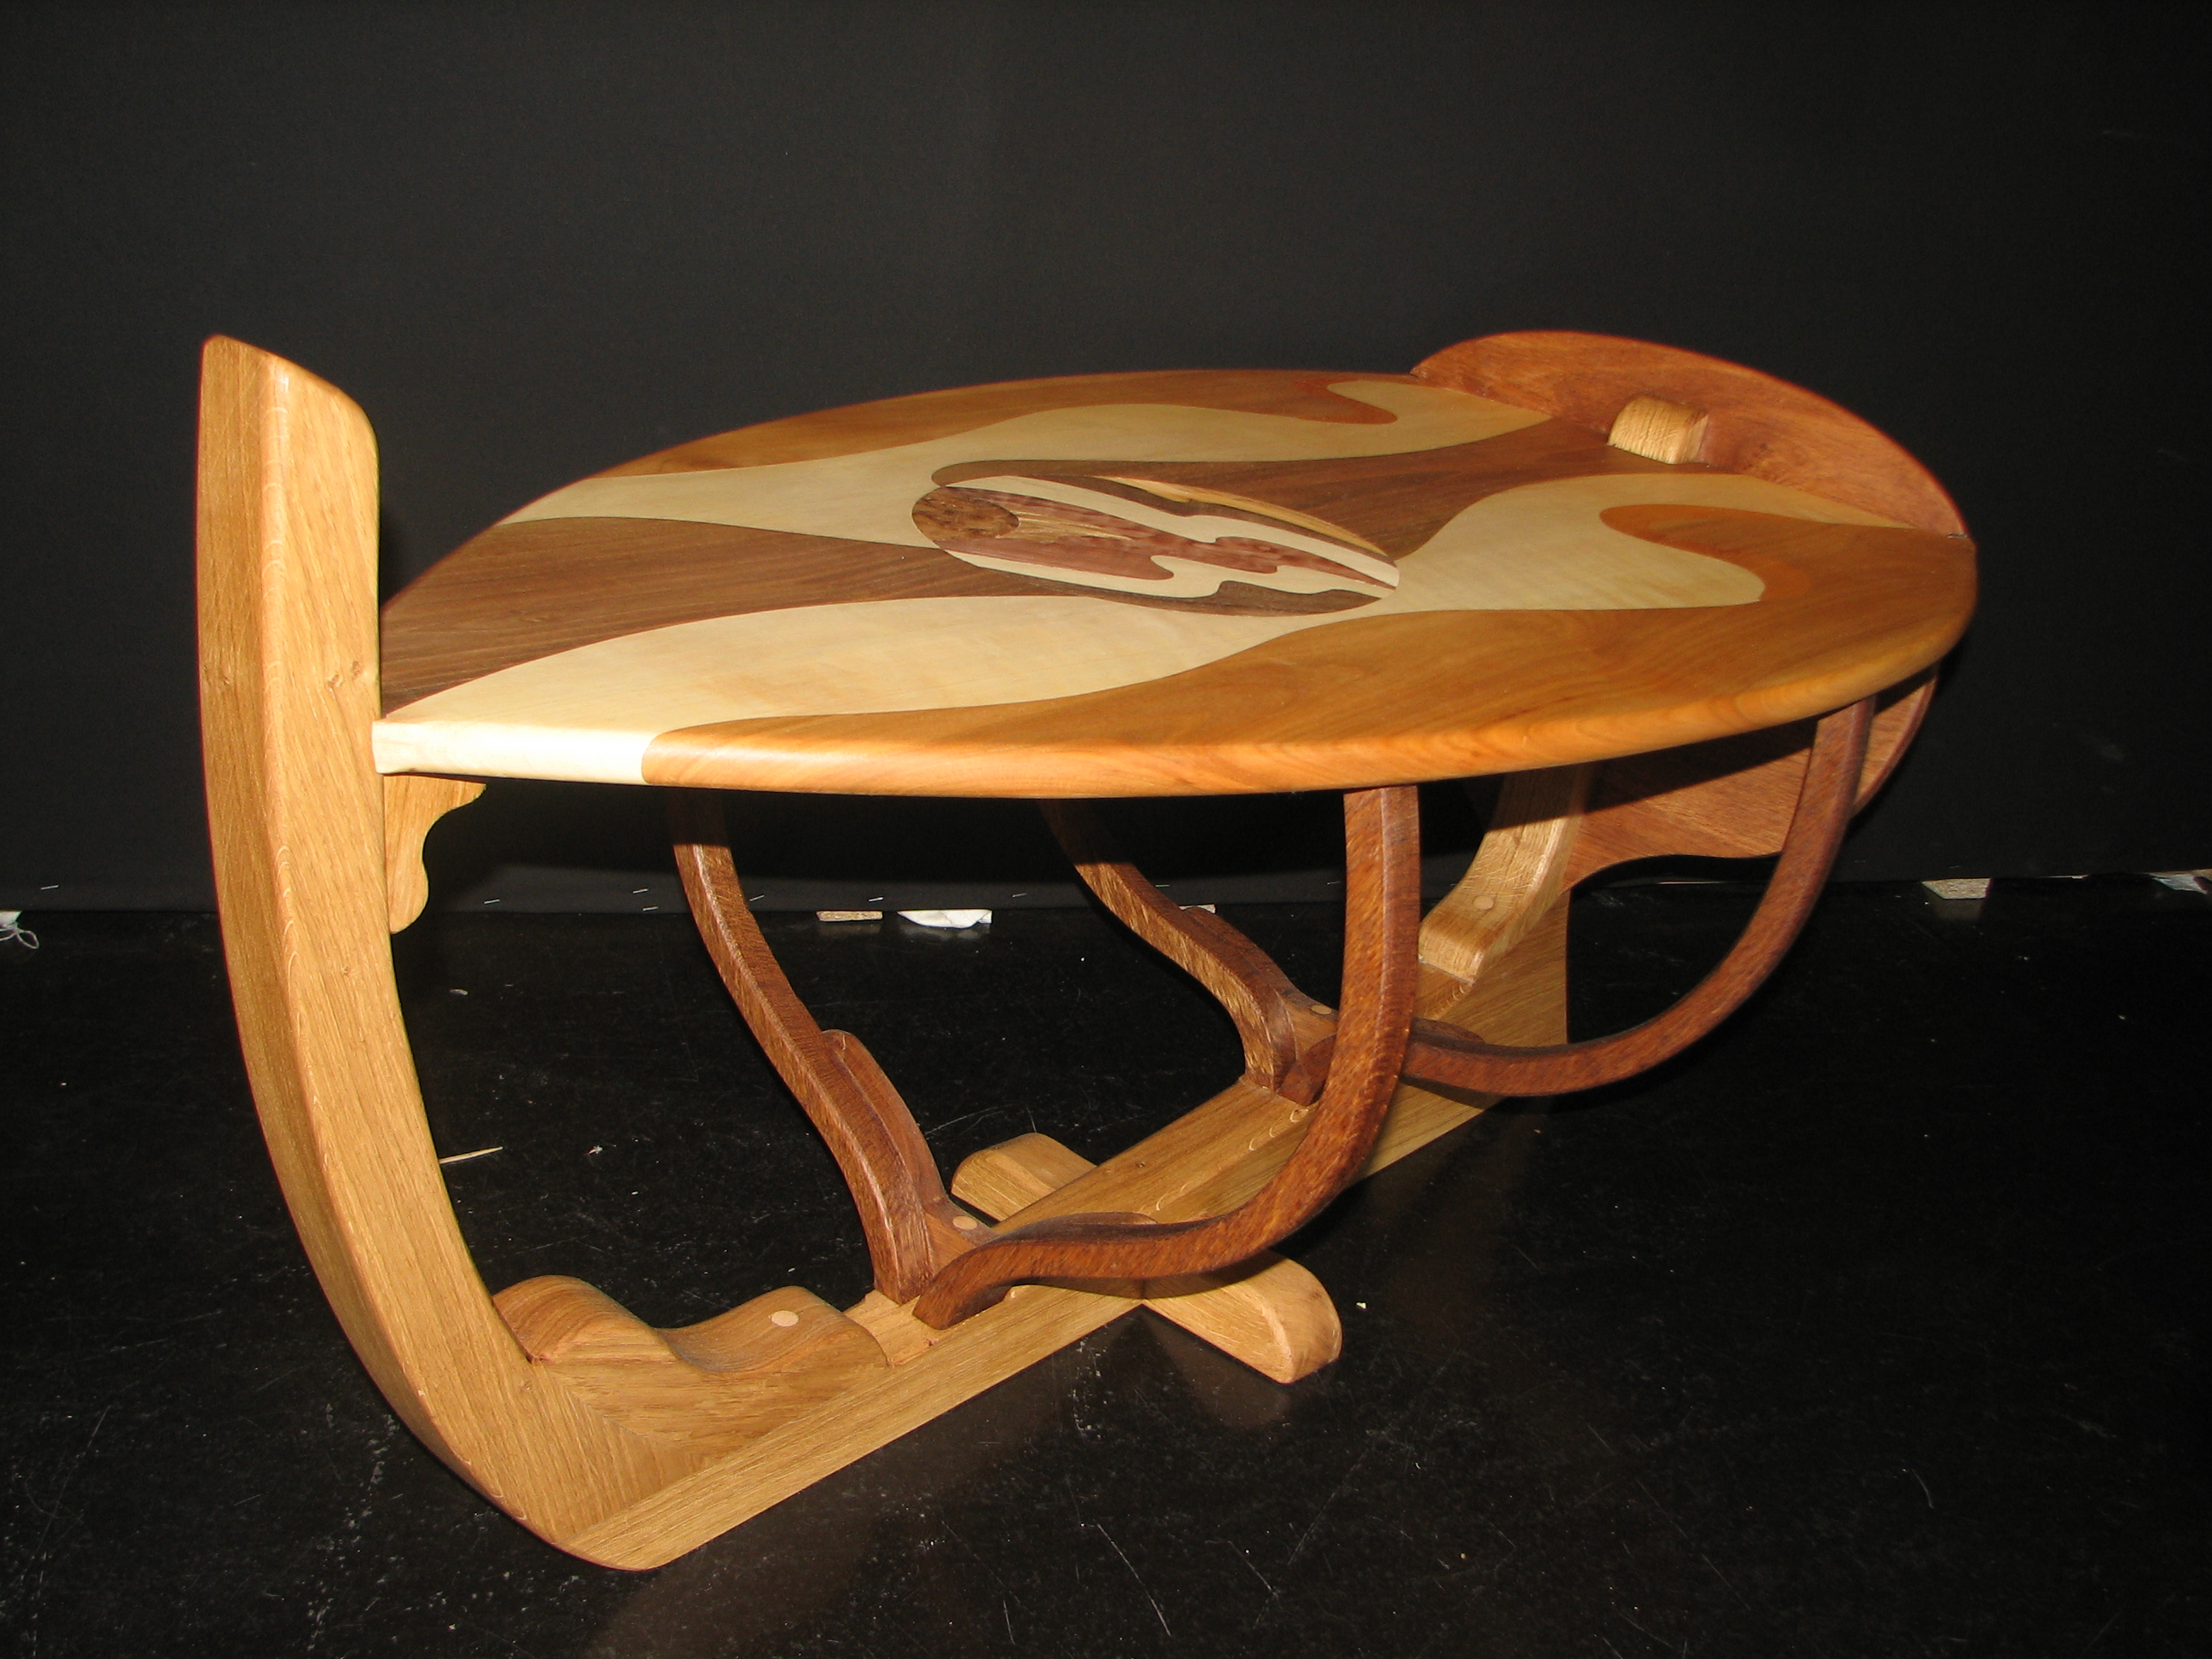 Atelier Soleil Bateau Basse – Table Leny FJ1lKcuT3